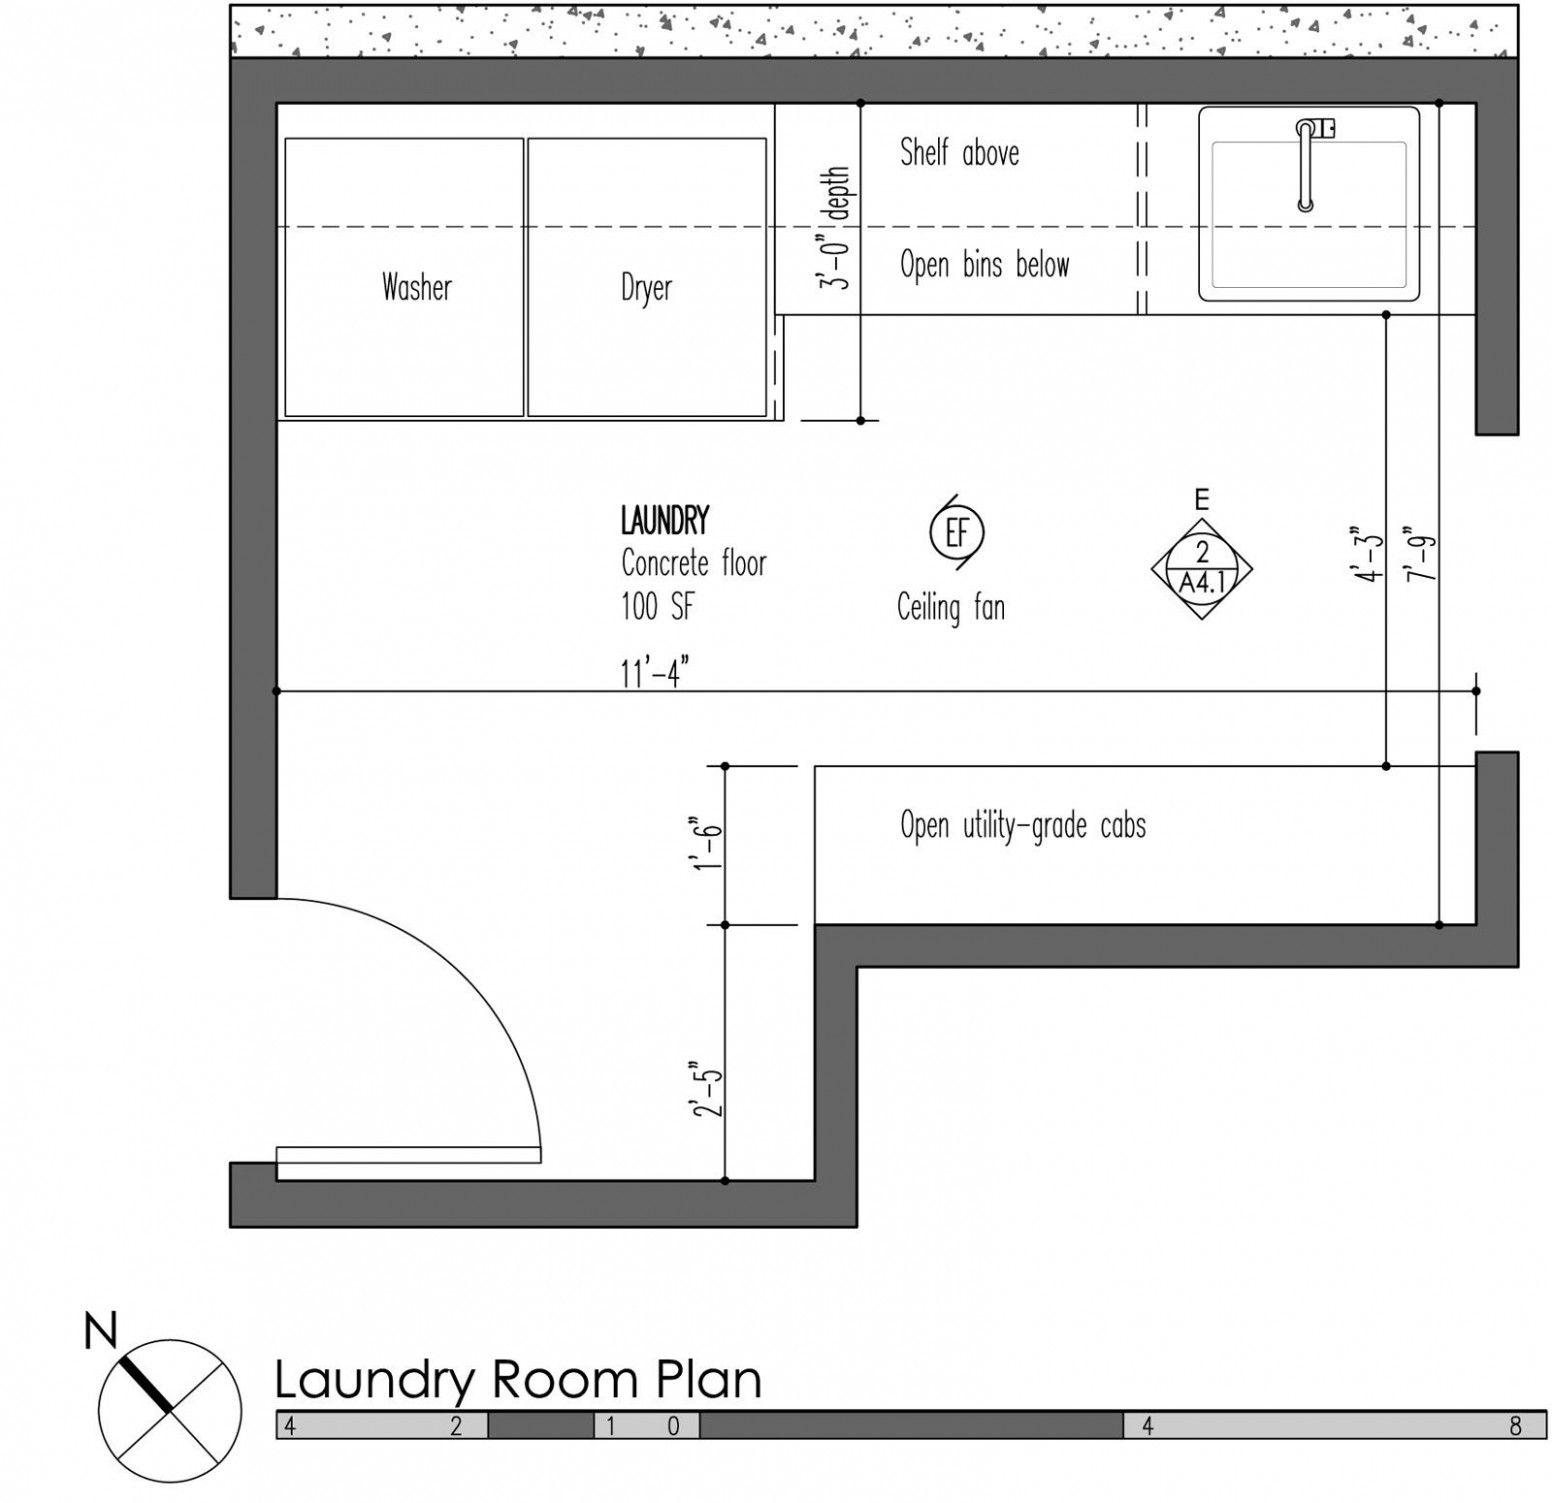 Laundry Room Floor Plan Example